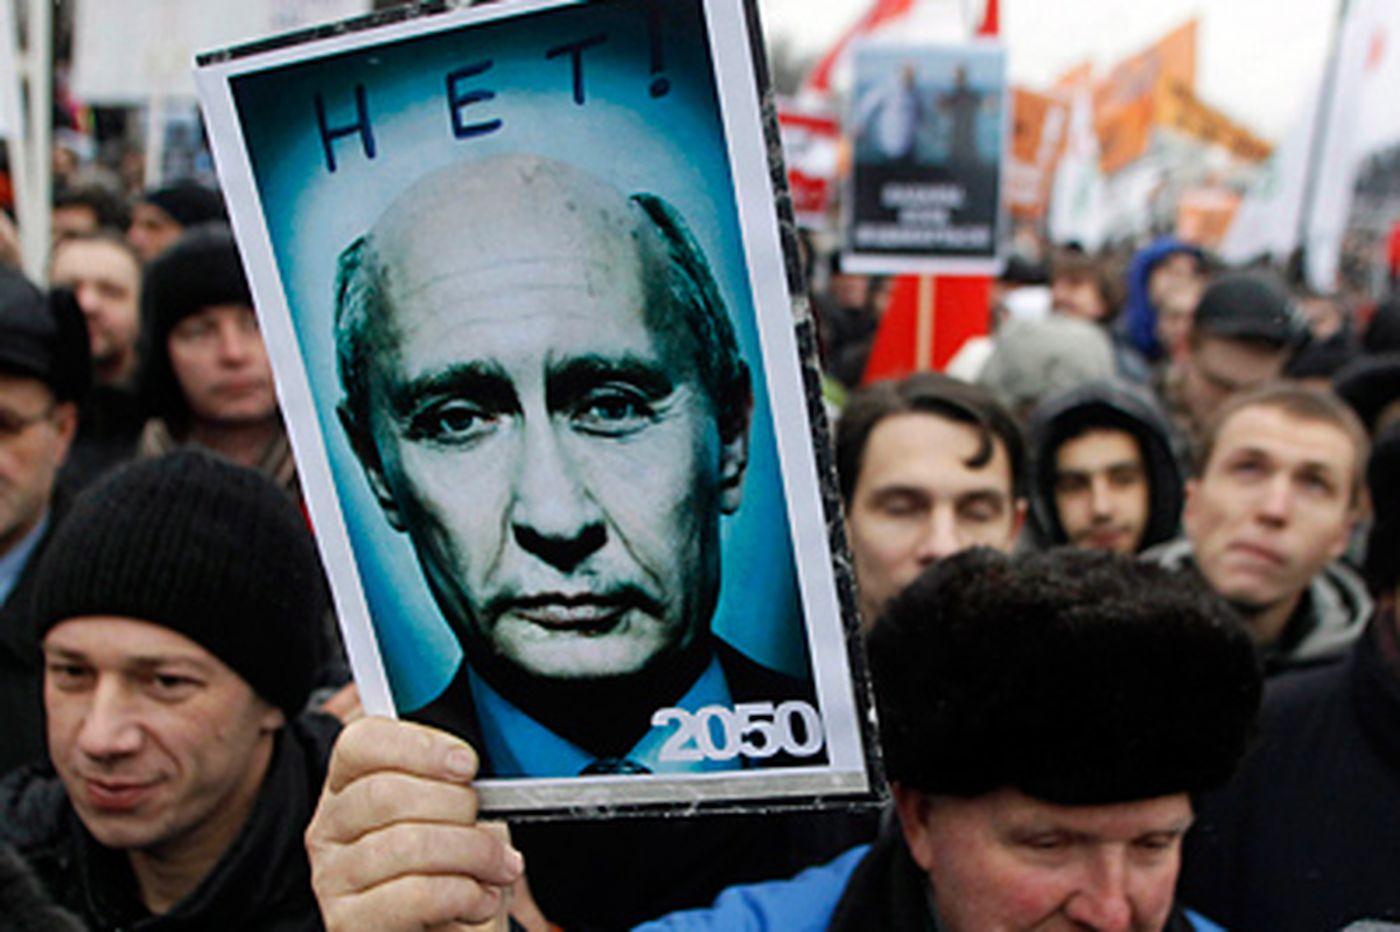 Moscow masses demand Putin go